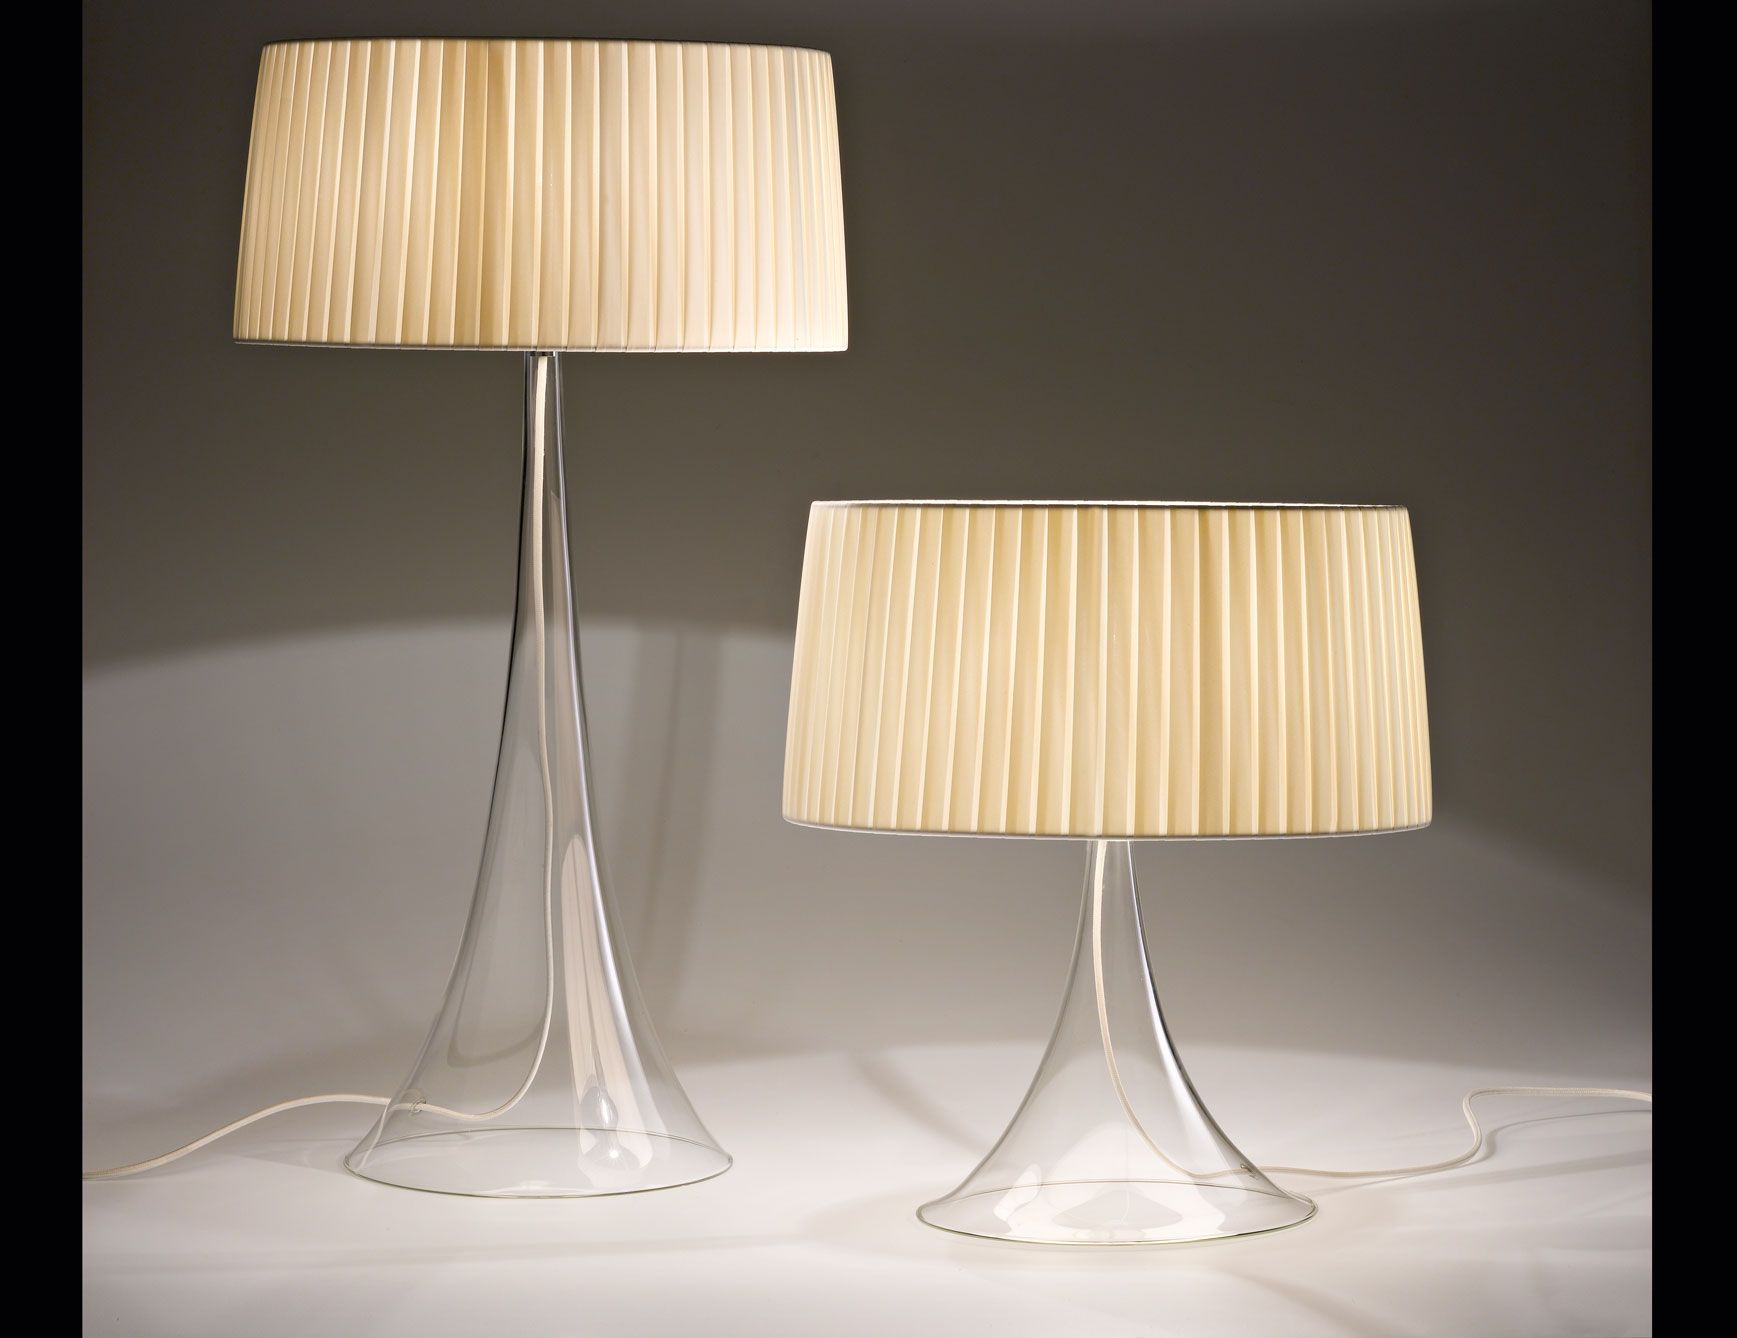 Nella Vetrina Cigno table lamp | Table lamp luxury, Table